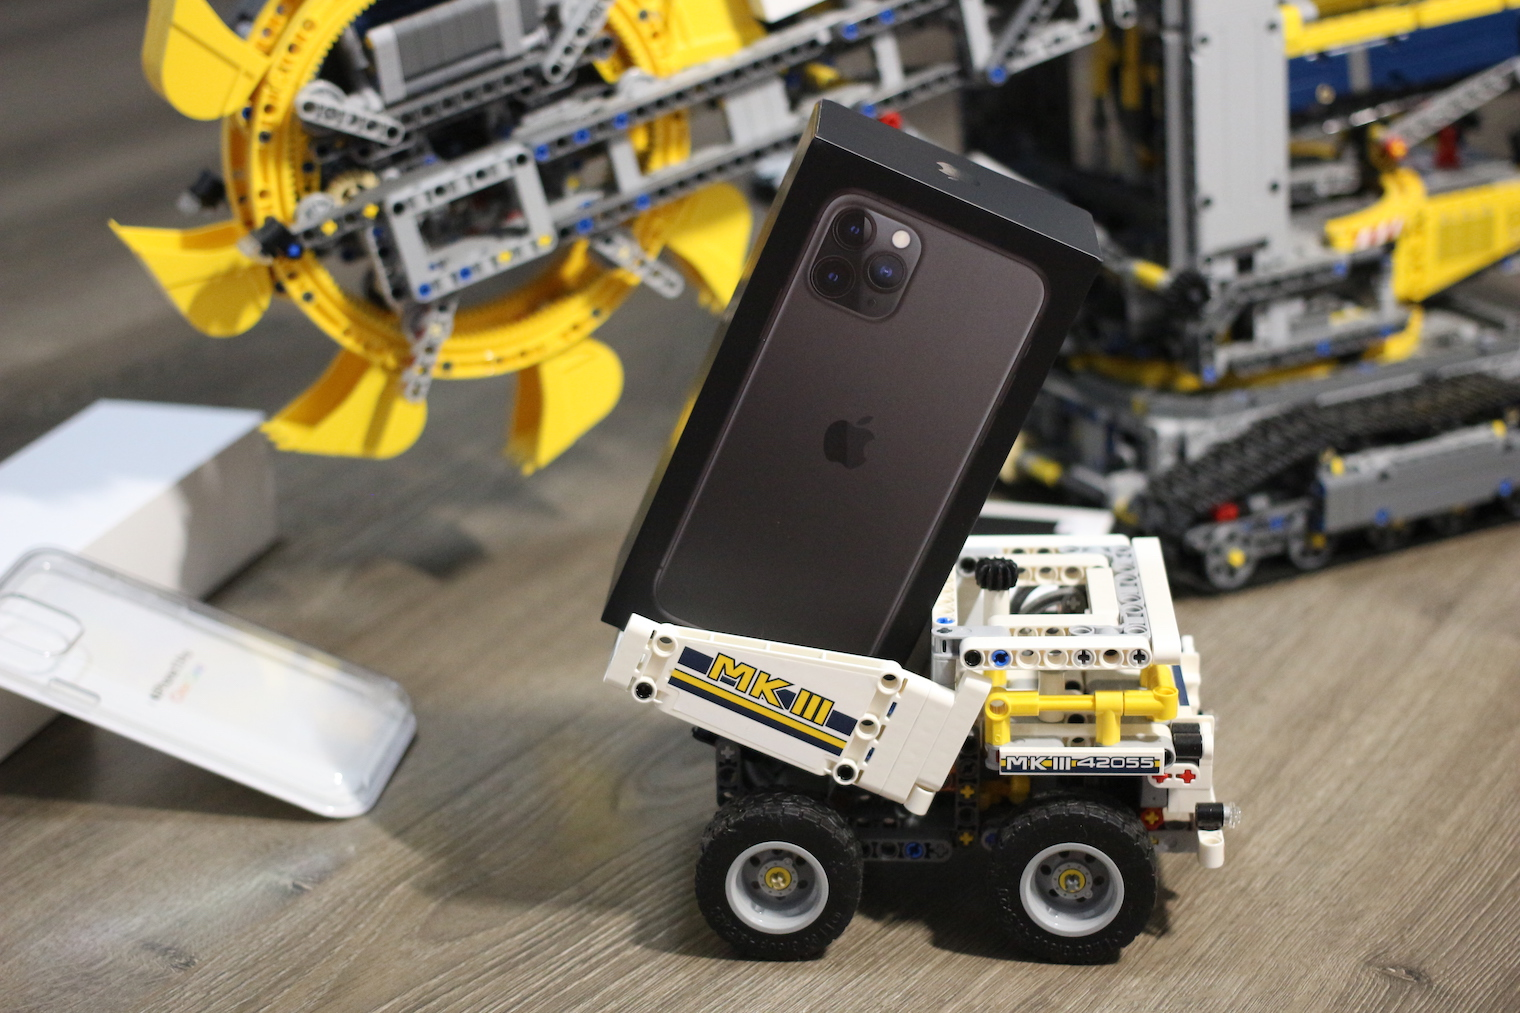 iPhone 11 Pro krabicka